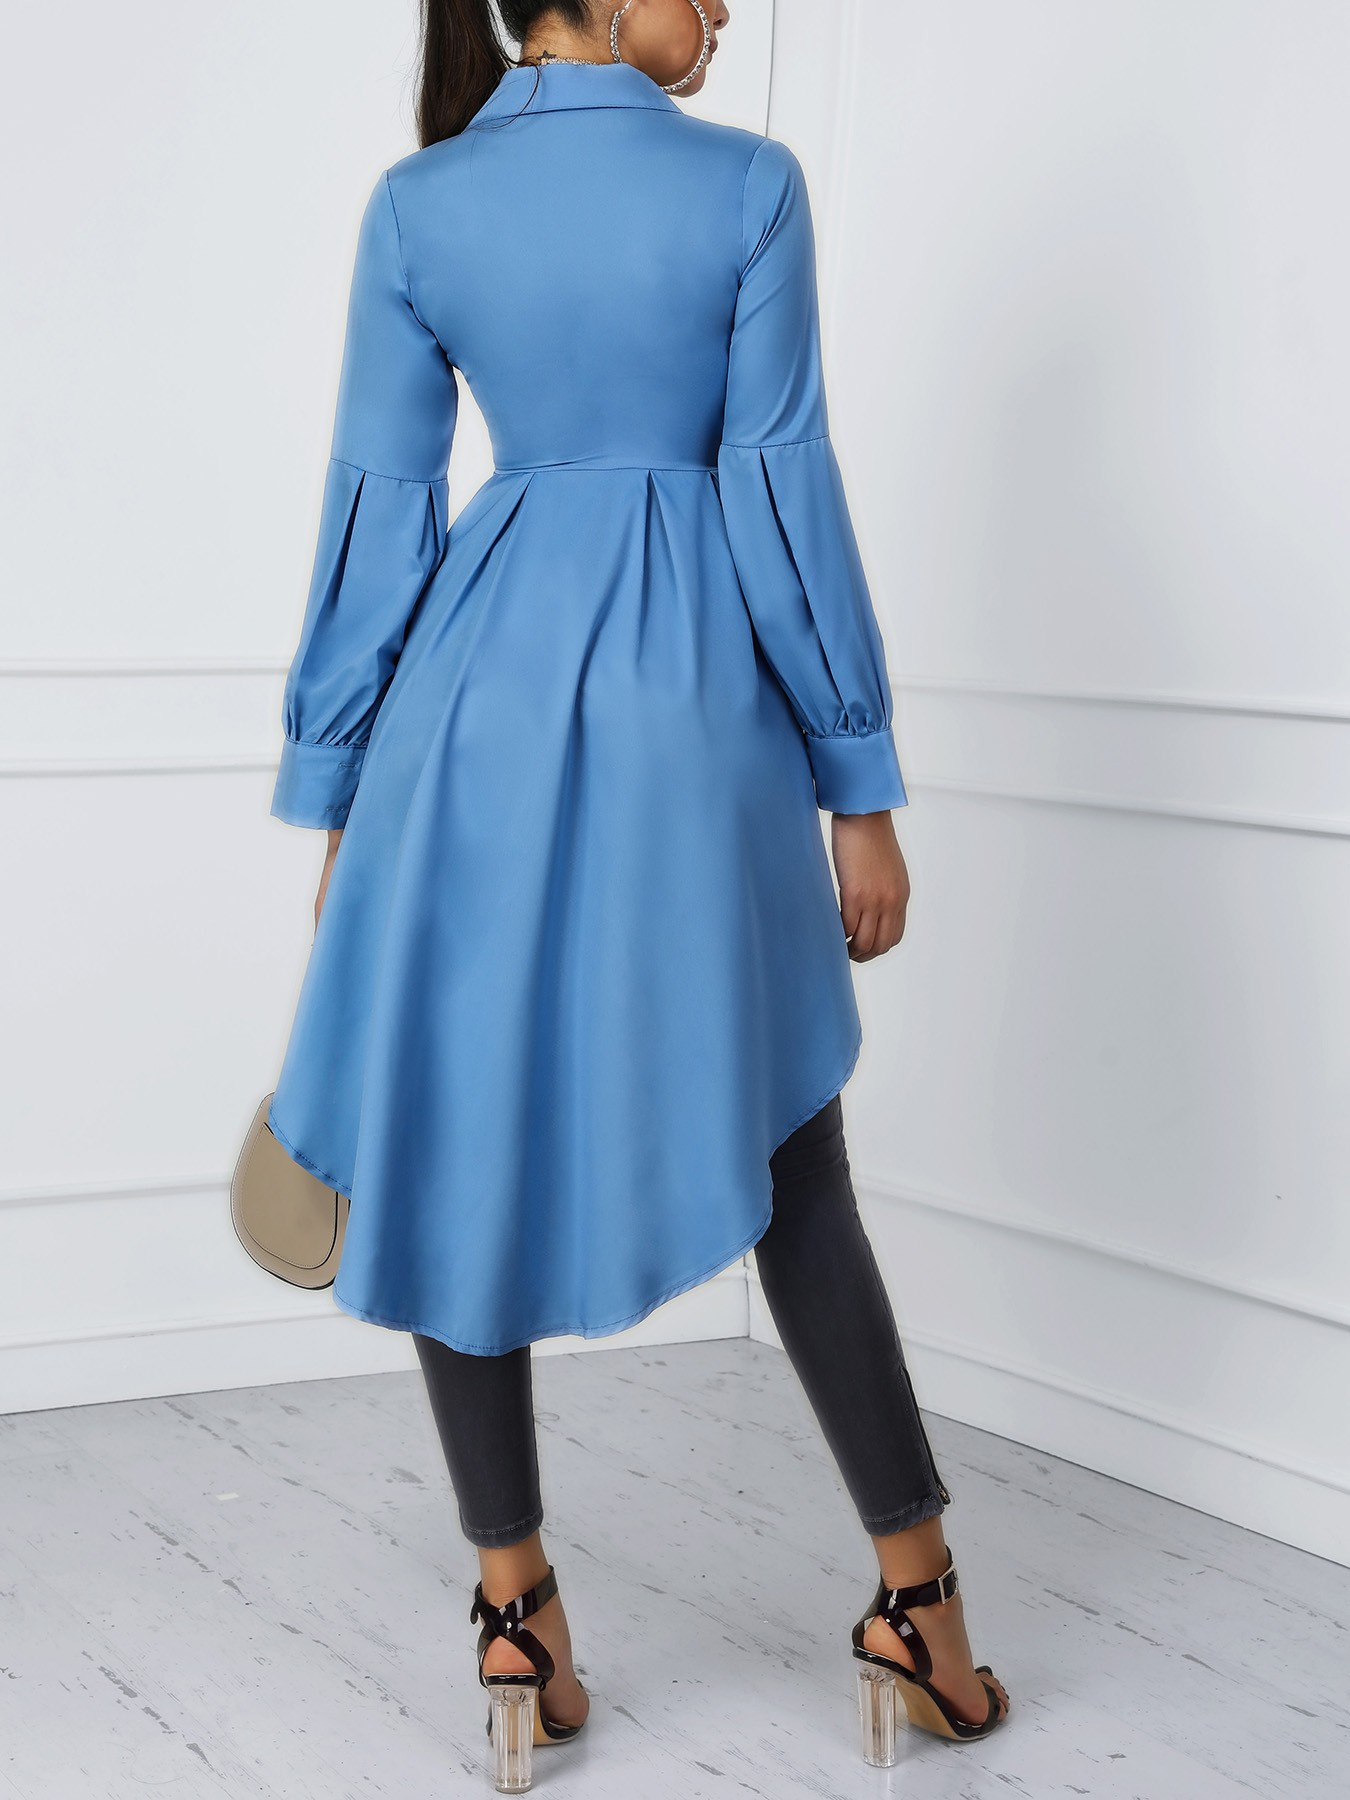 boutiquefeel / Lantern Sleeve Button Design Dip Hem Blouse